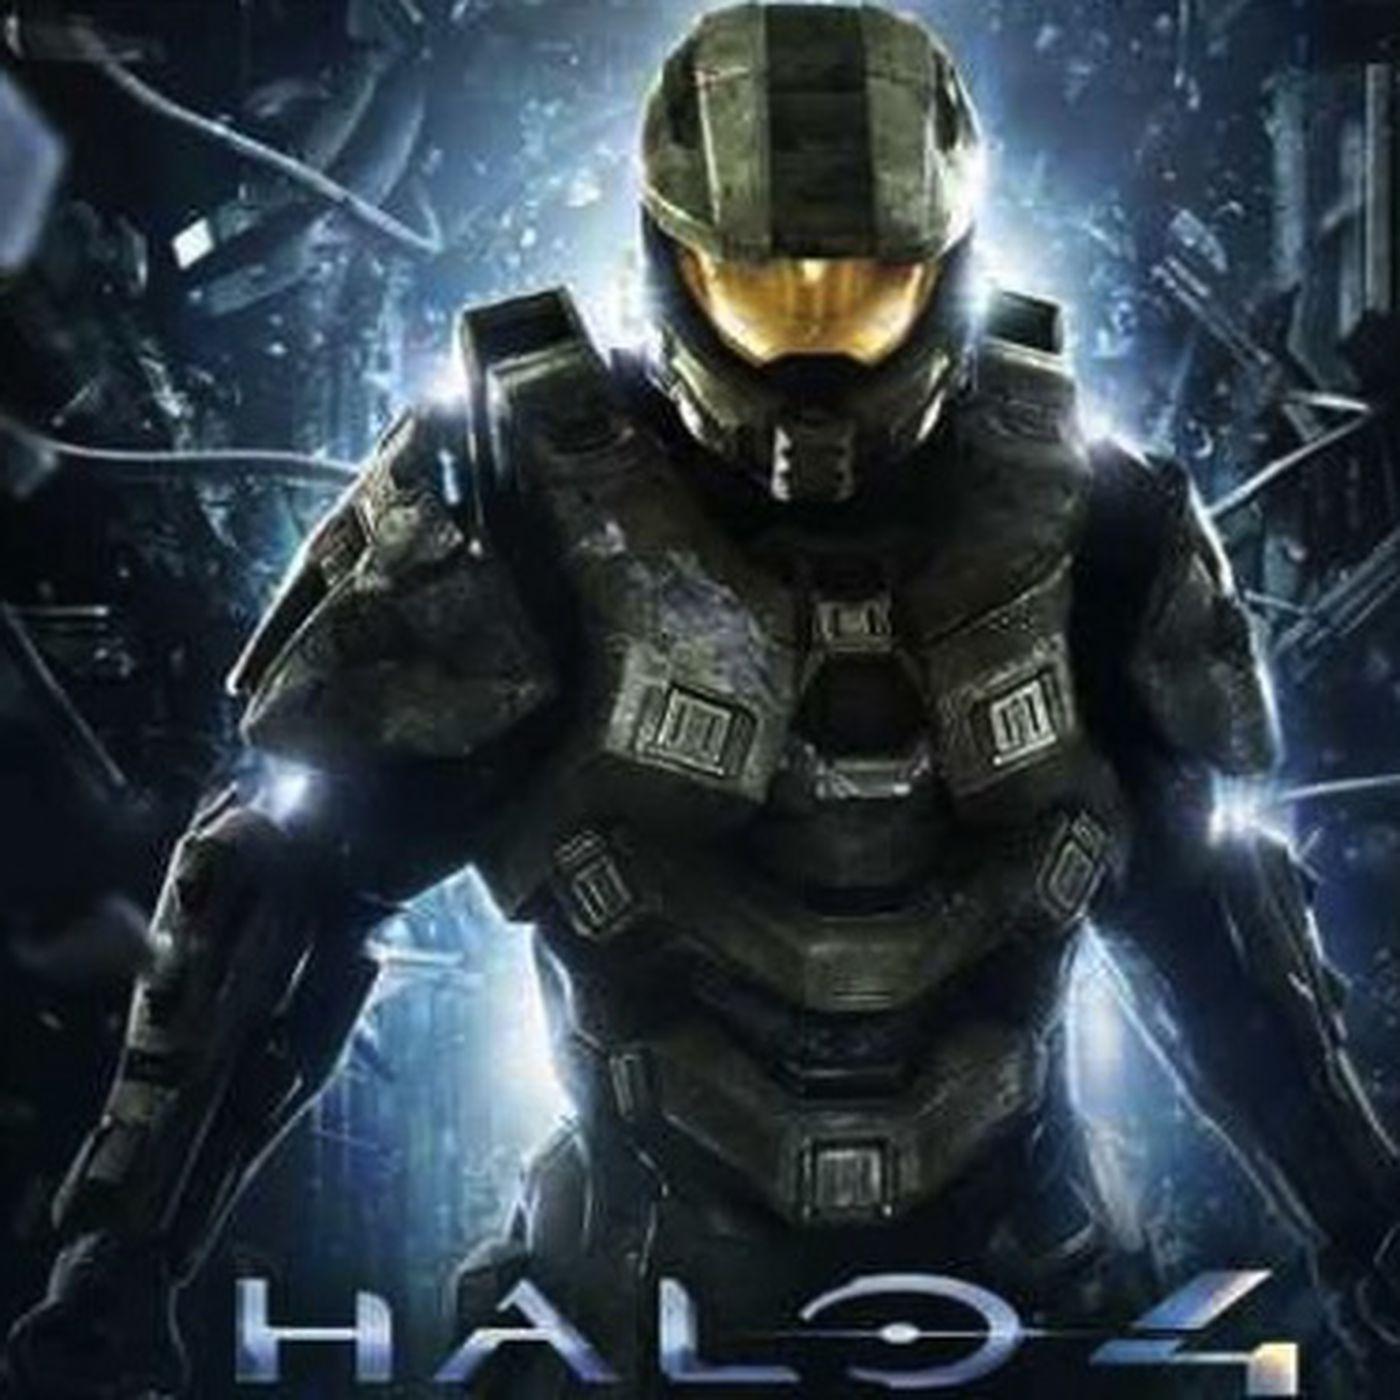 Halo 4 Release Date Is Nov 6 Conan Airing Tonight Polygon